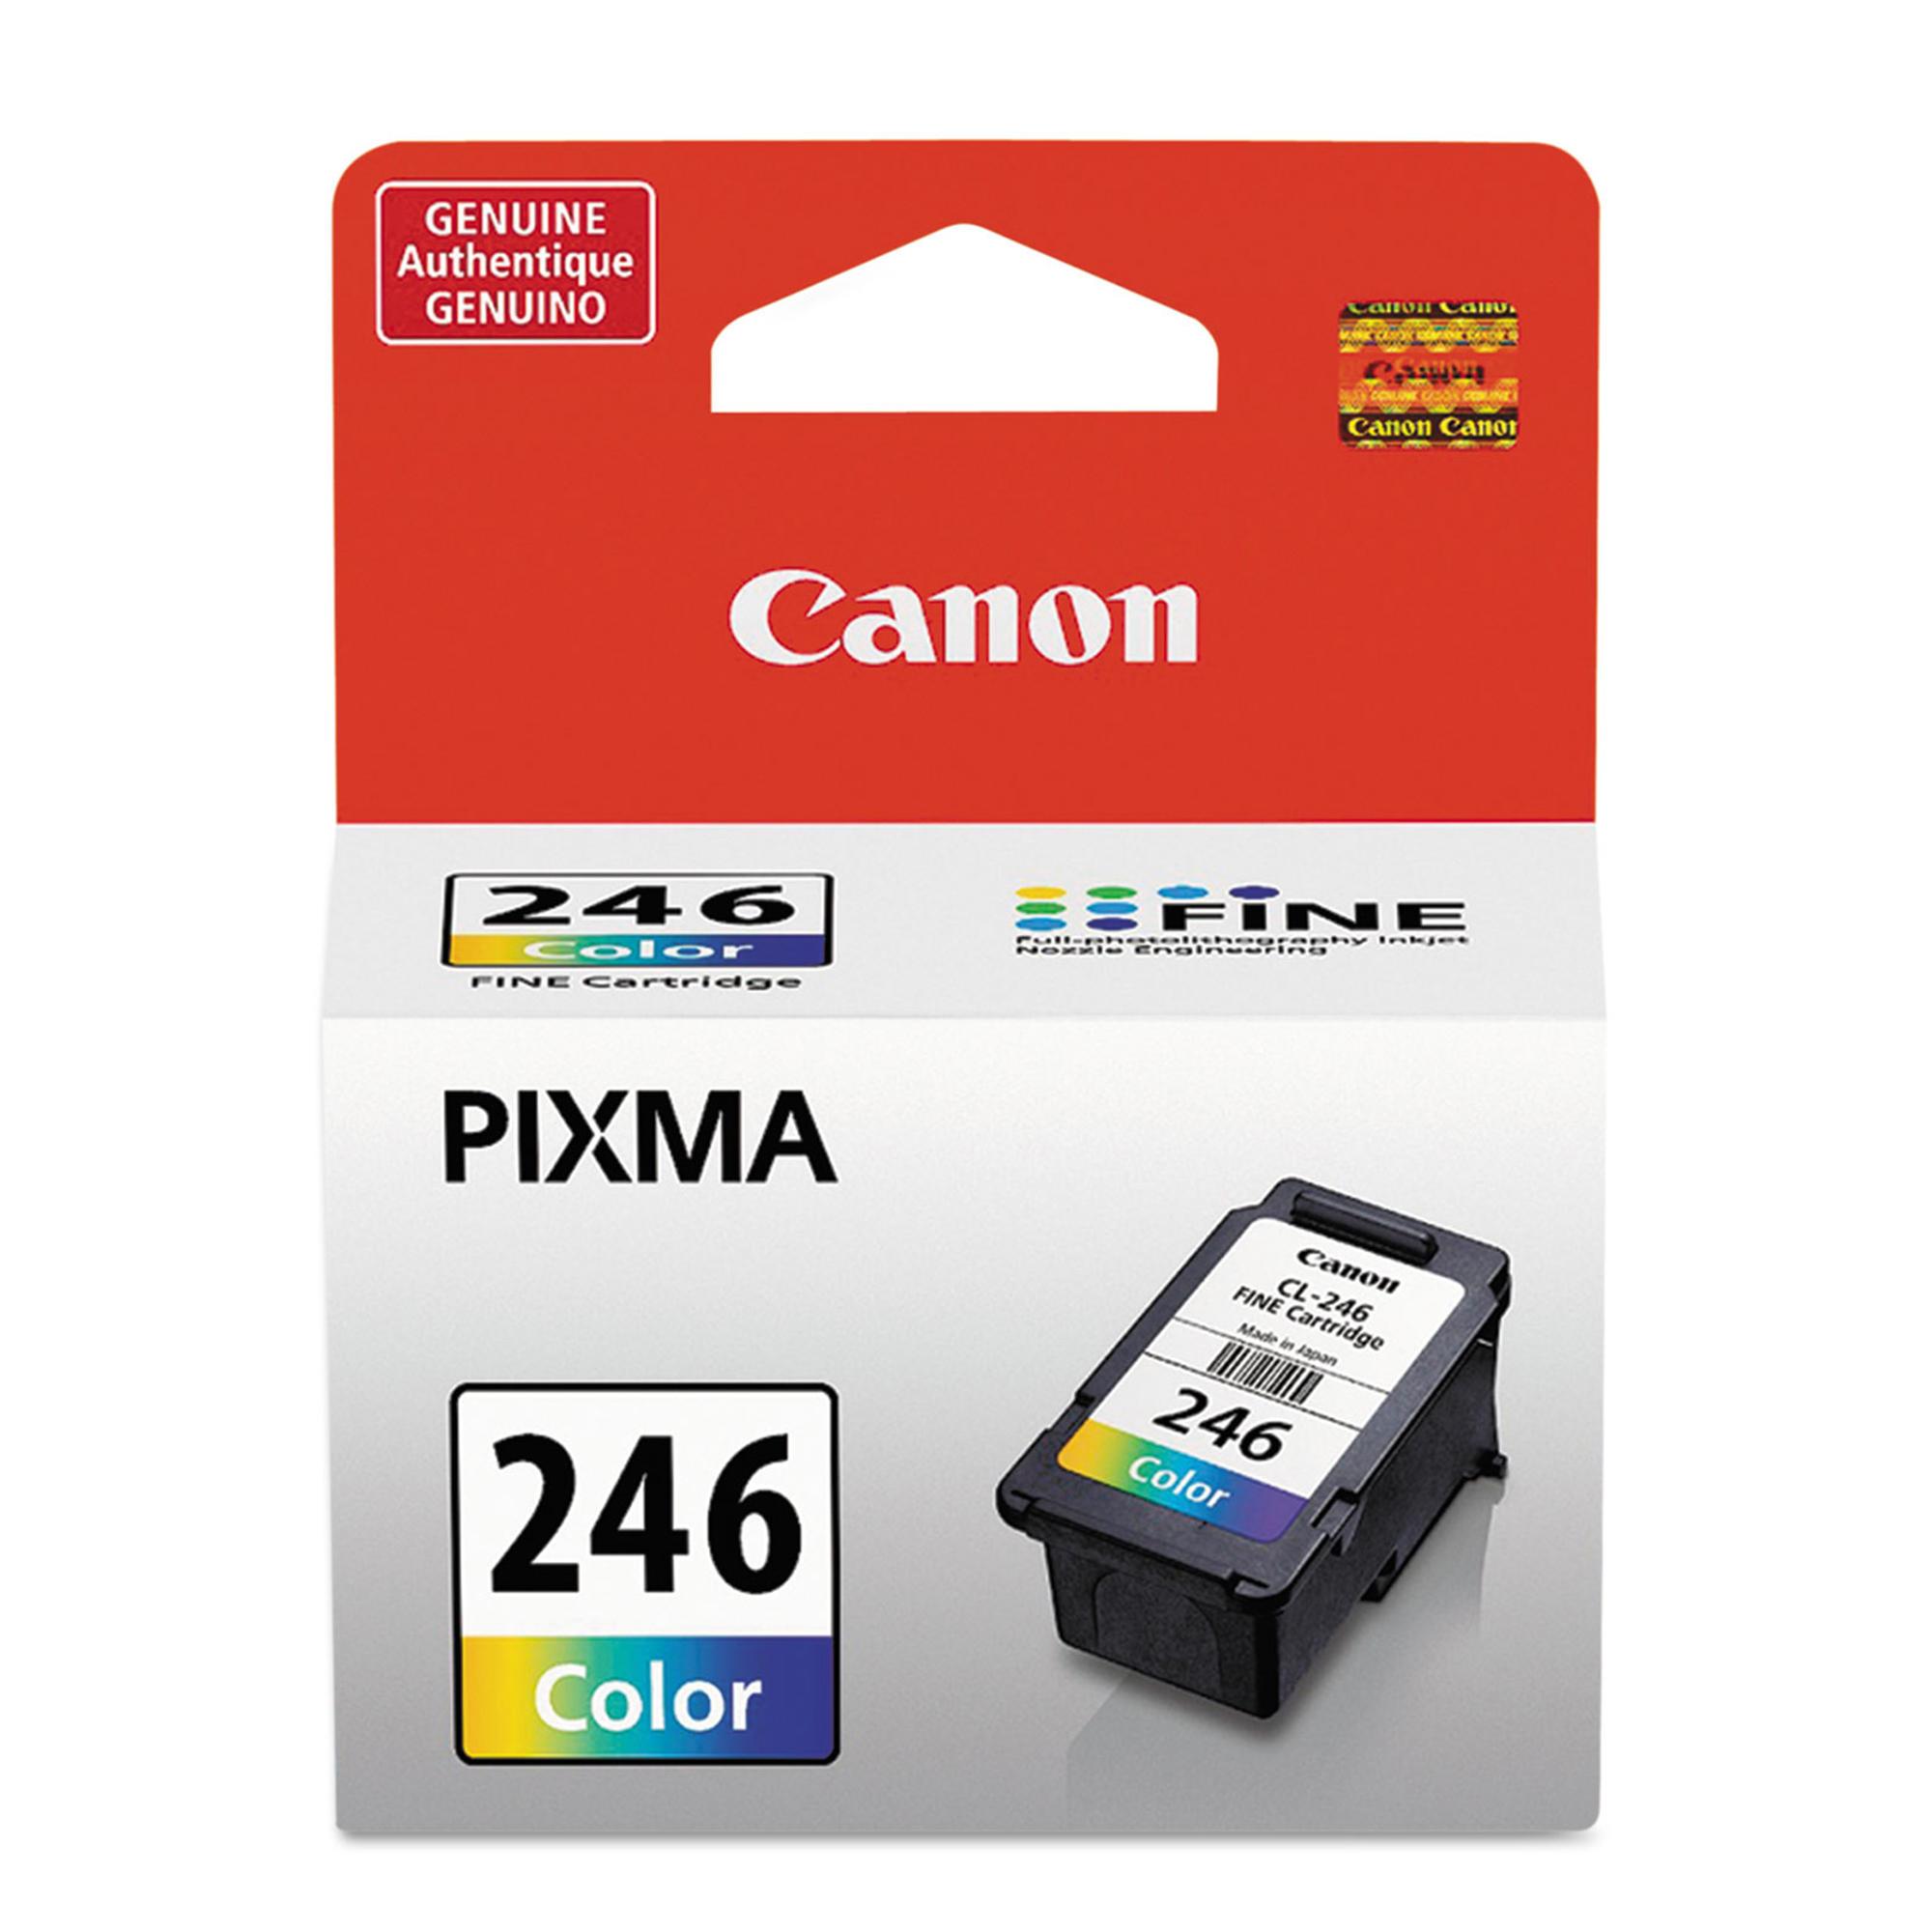 Canon CL246 Original Color Ink Cartridge (8281B001)